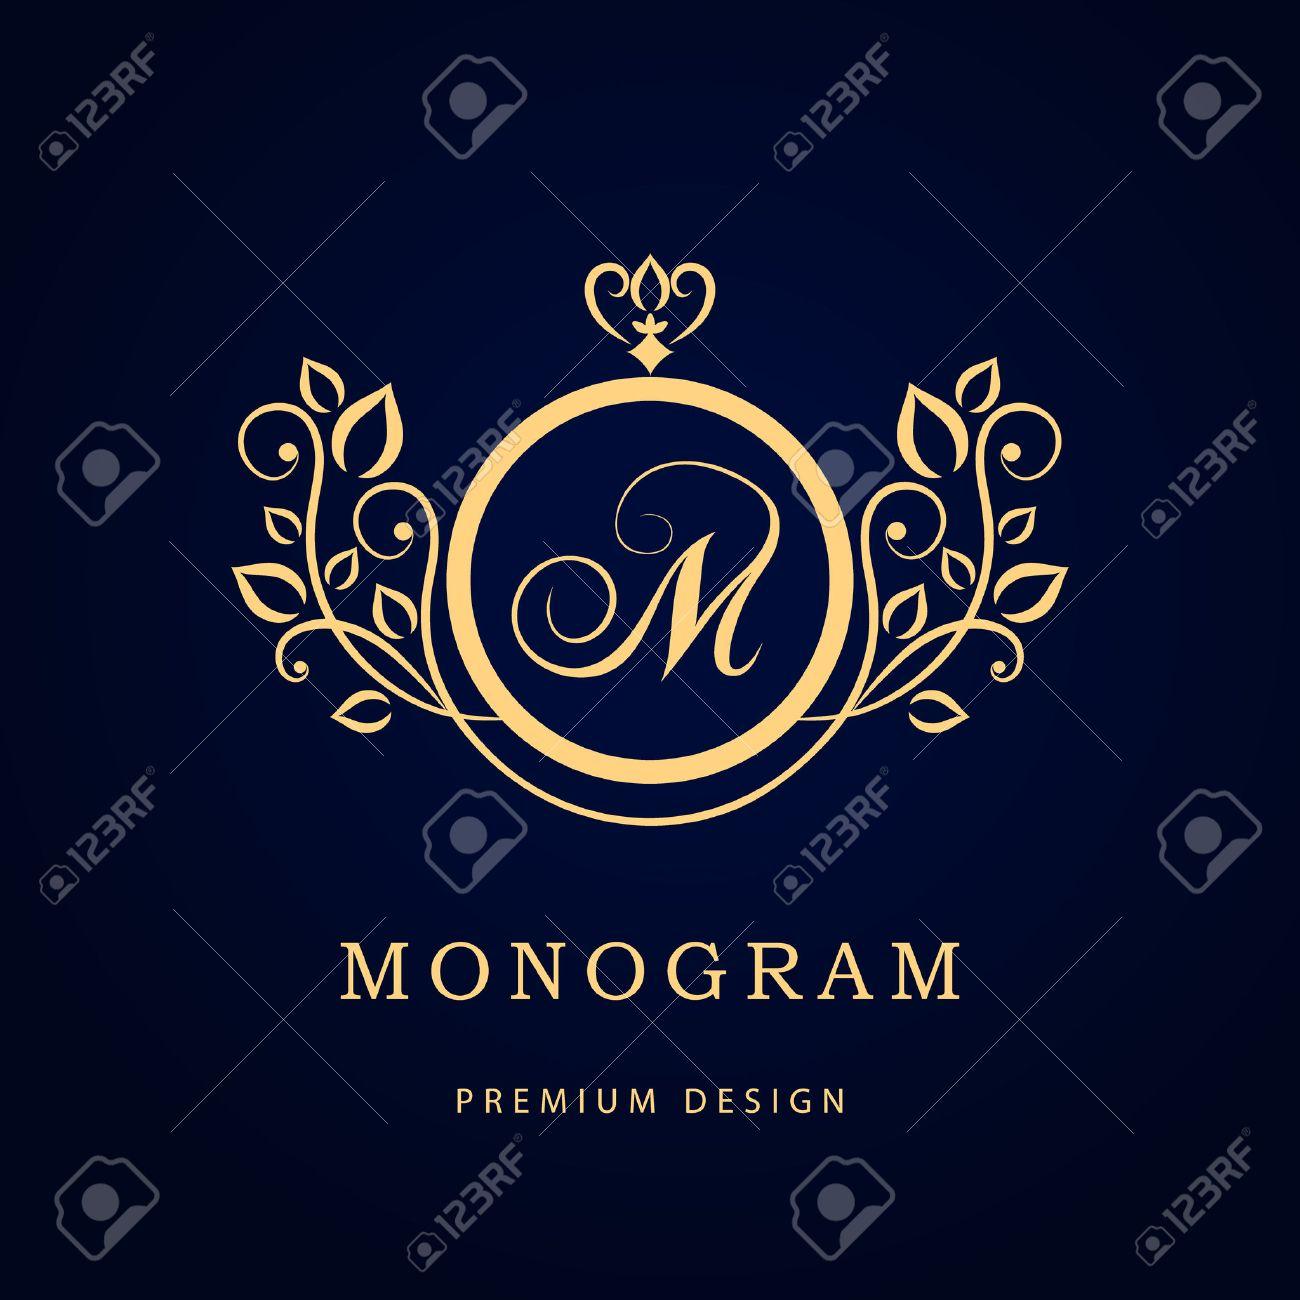 Vector illustration of Monogram design elements graceful template. Elegant line art logo design. Business sign identity for Restaurant Royalty Boutique Cafe Hotel Heraldic Jewelry Fashion Wine. - 42590938